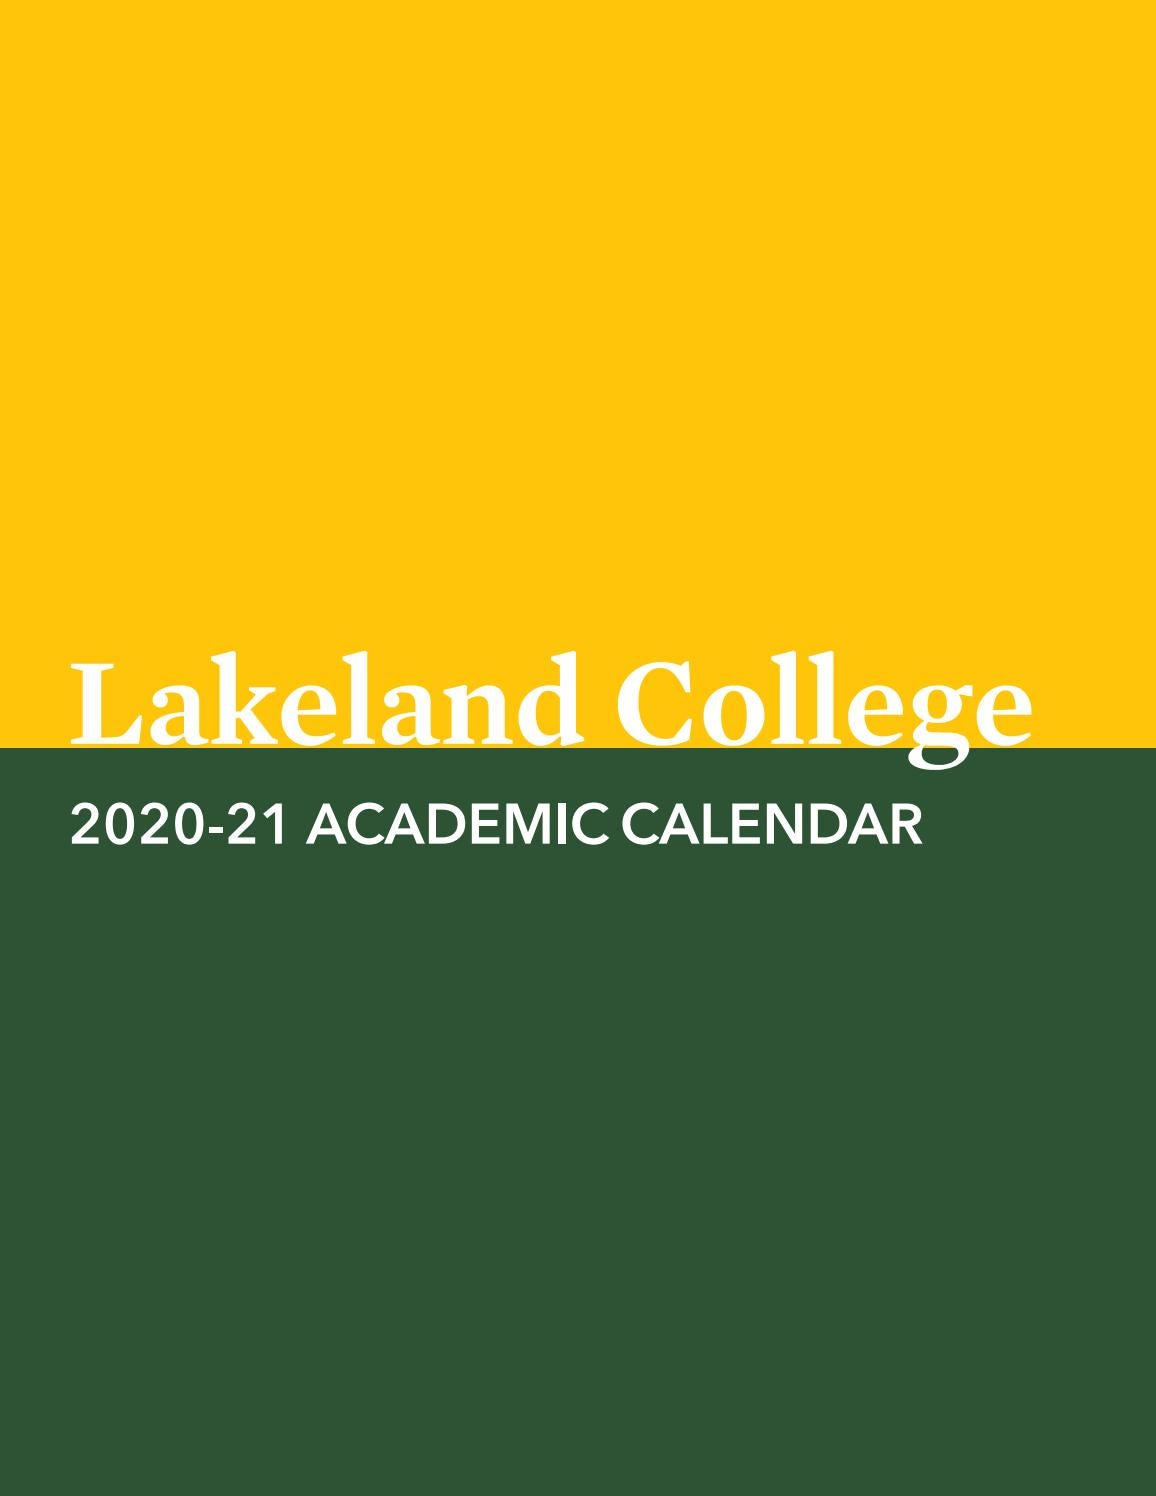 University Of Utah Academic Calendar Fall 2022.2020 21 Academic Calendar Lakeland College By Lakeland College Canada Issuu